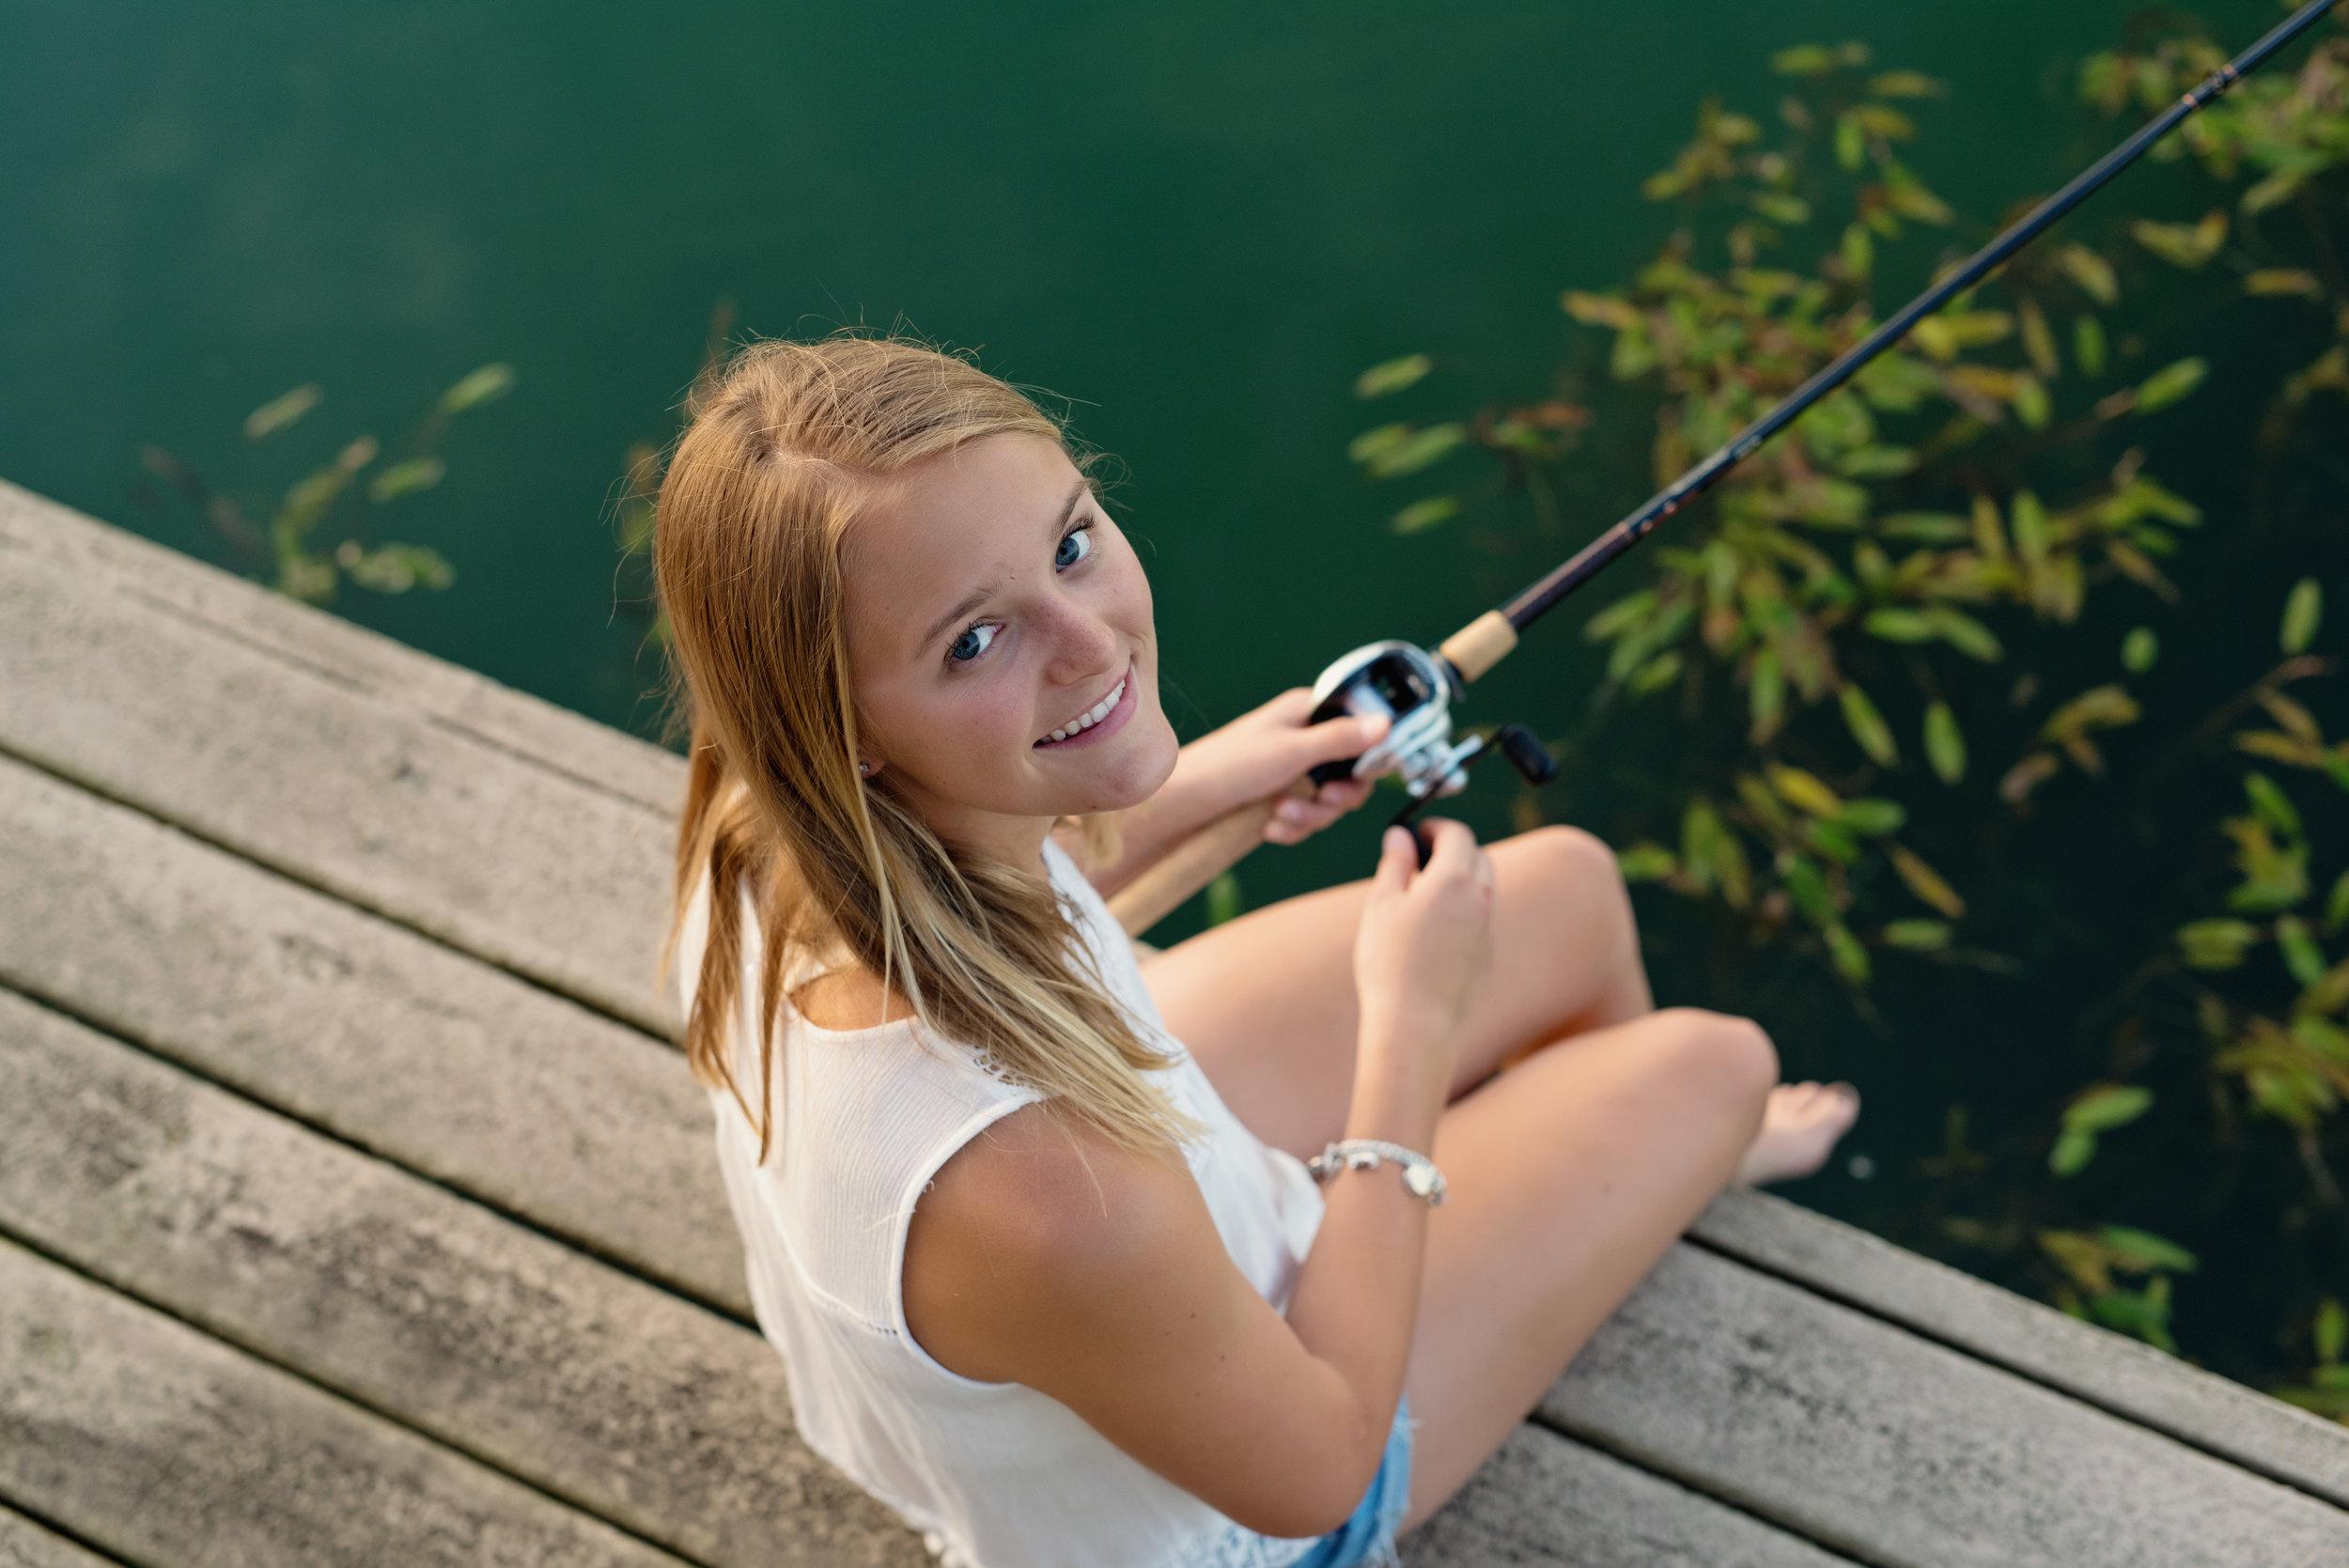 Fishing senior photos ideas